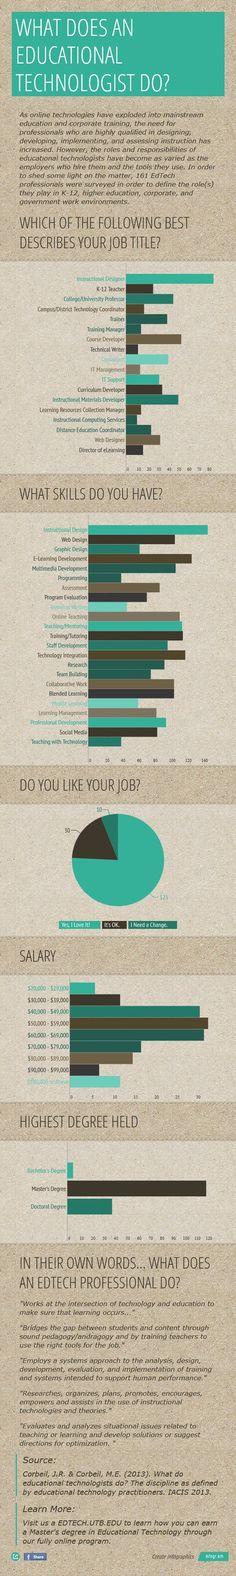 393 Best Talent Development Images On Pinterest Instructional